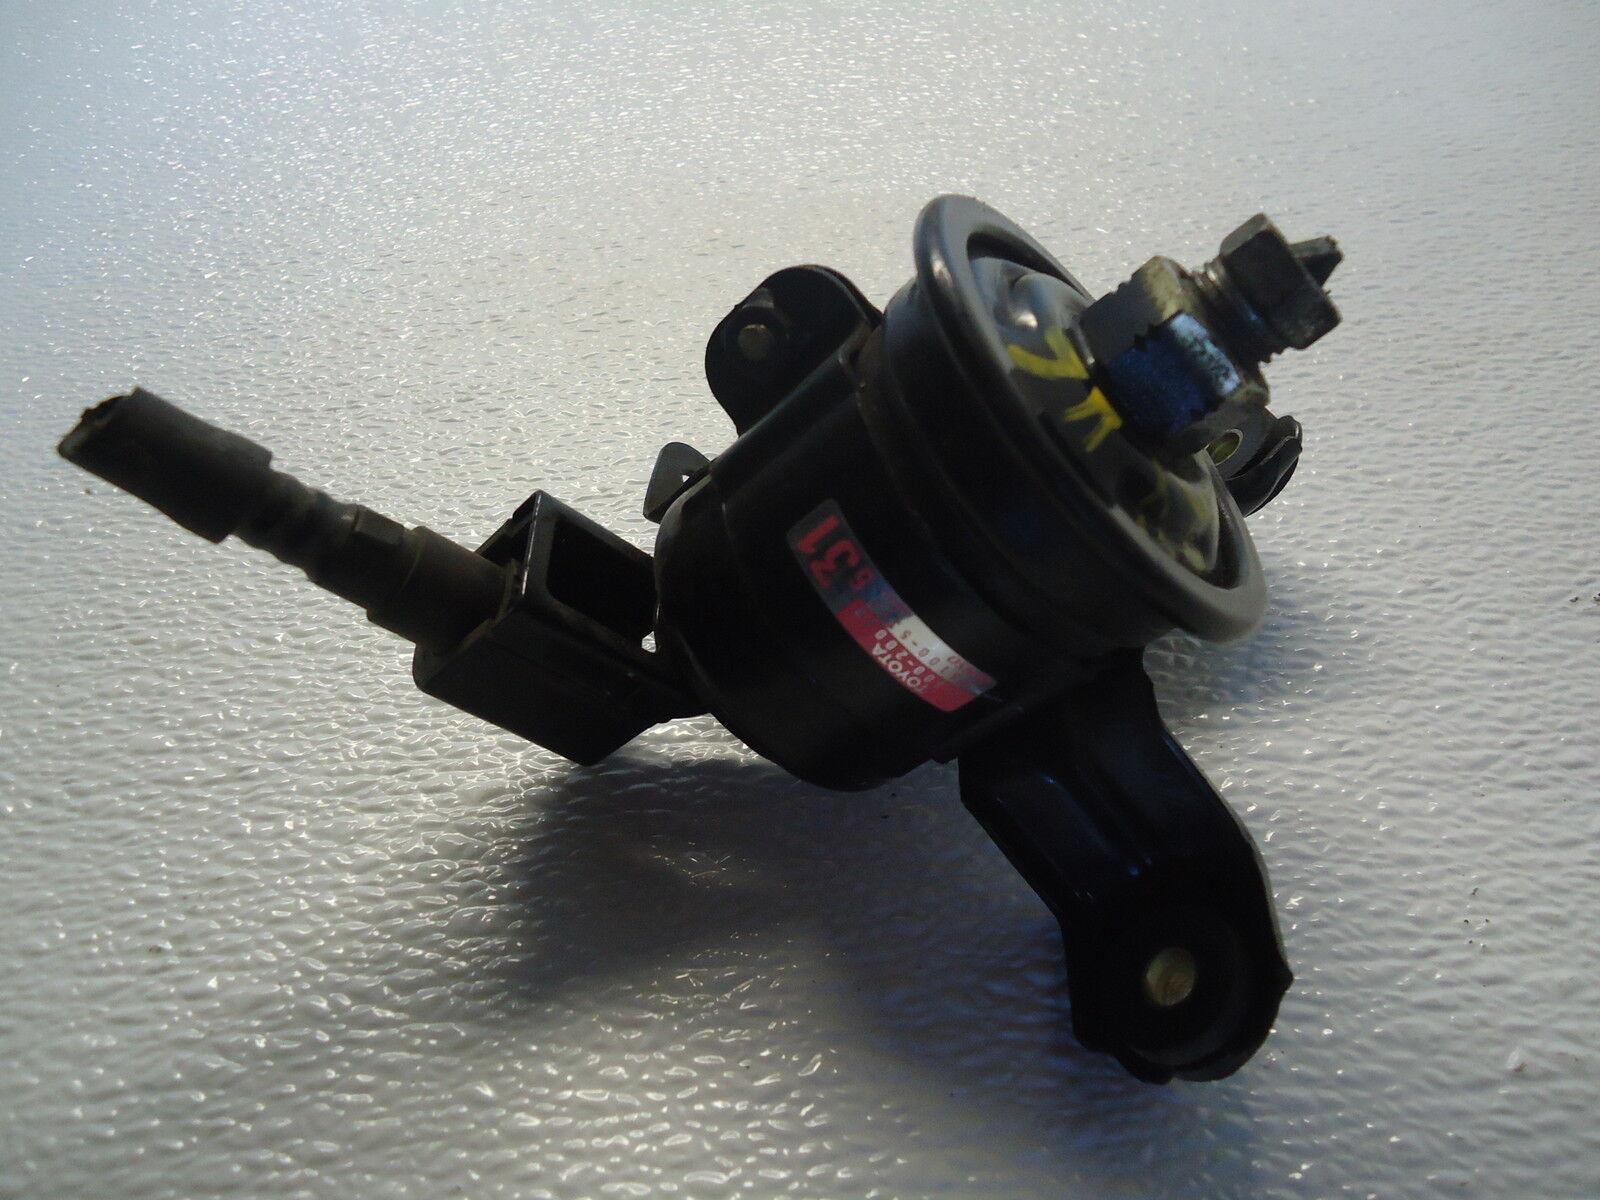 Oem Toyota Lexus Es300 Avalon Camry Solara Fuel Filter 23300 20040 2001 Location 186100 5311 Ebay